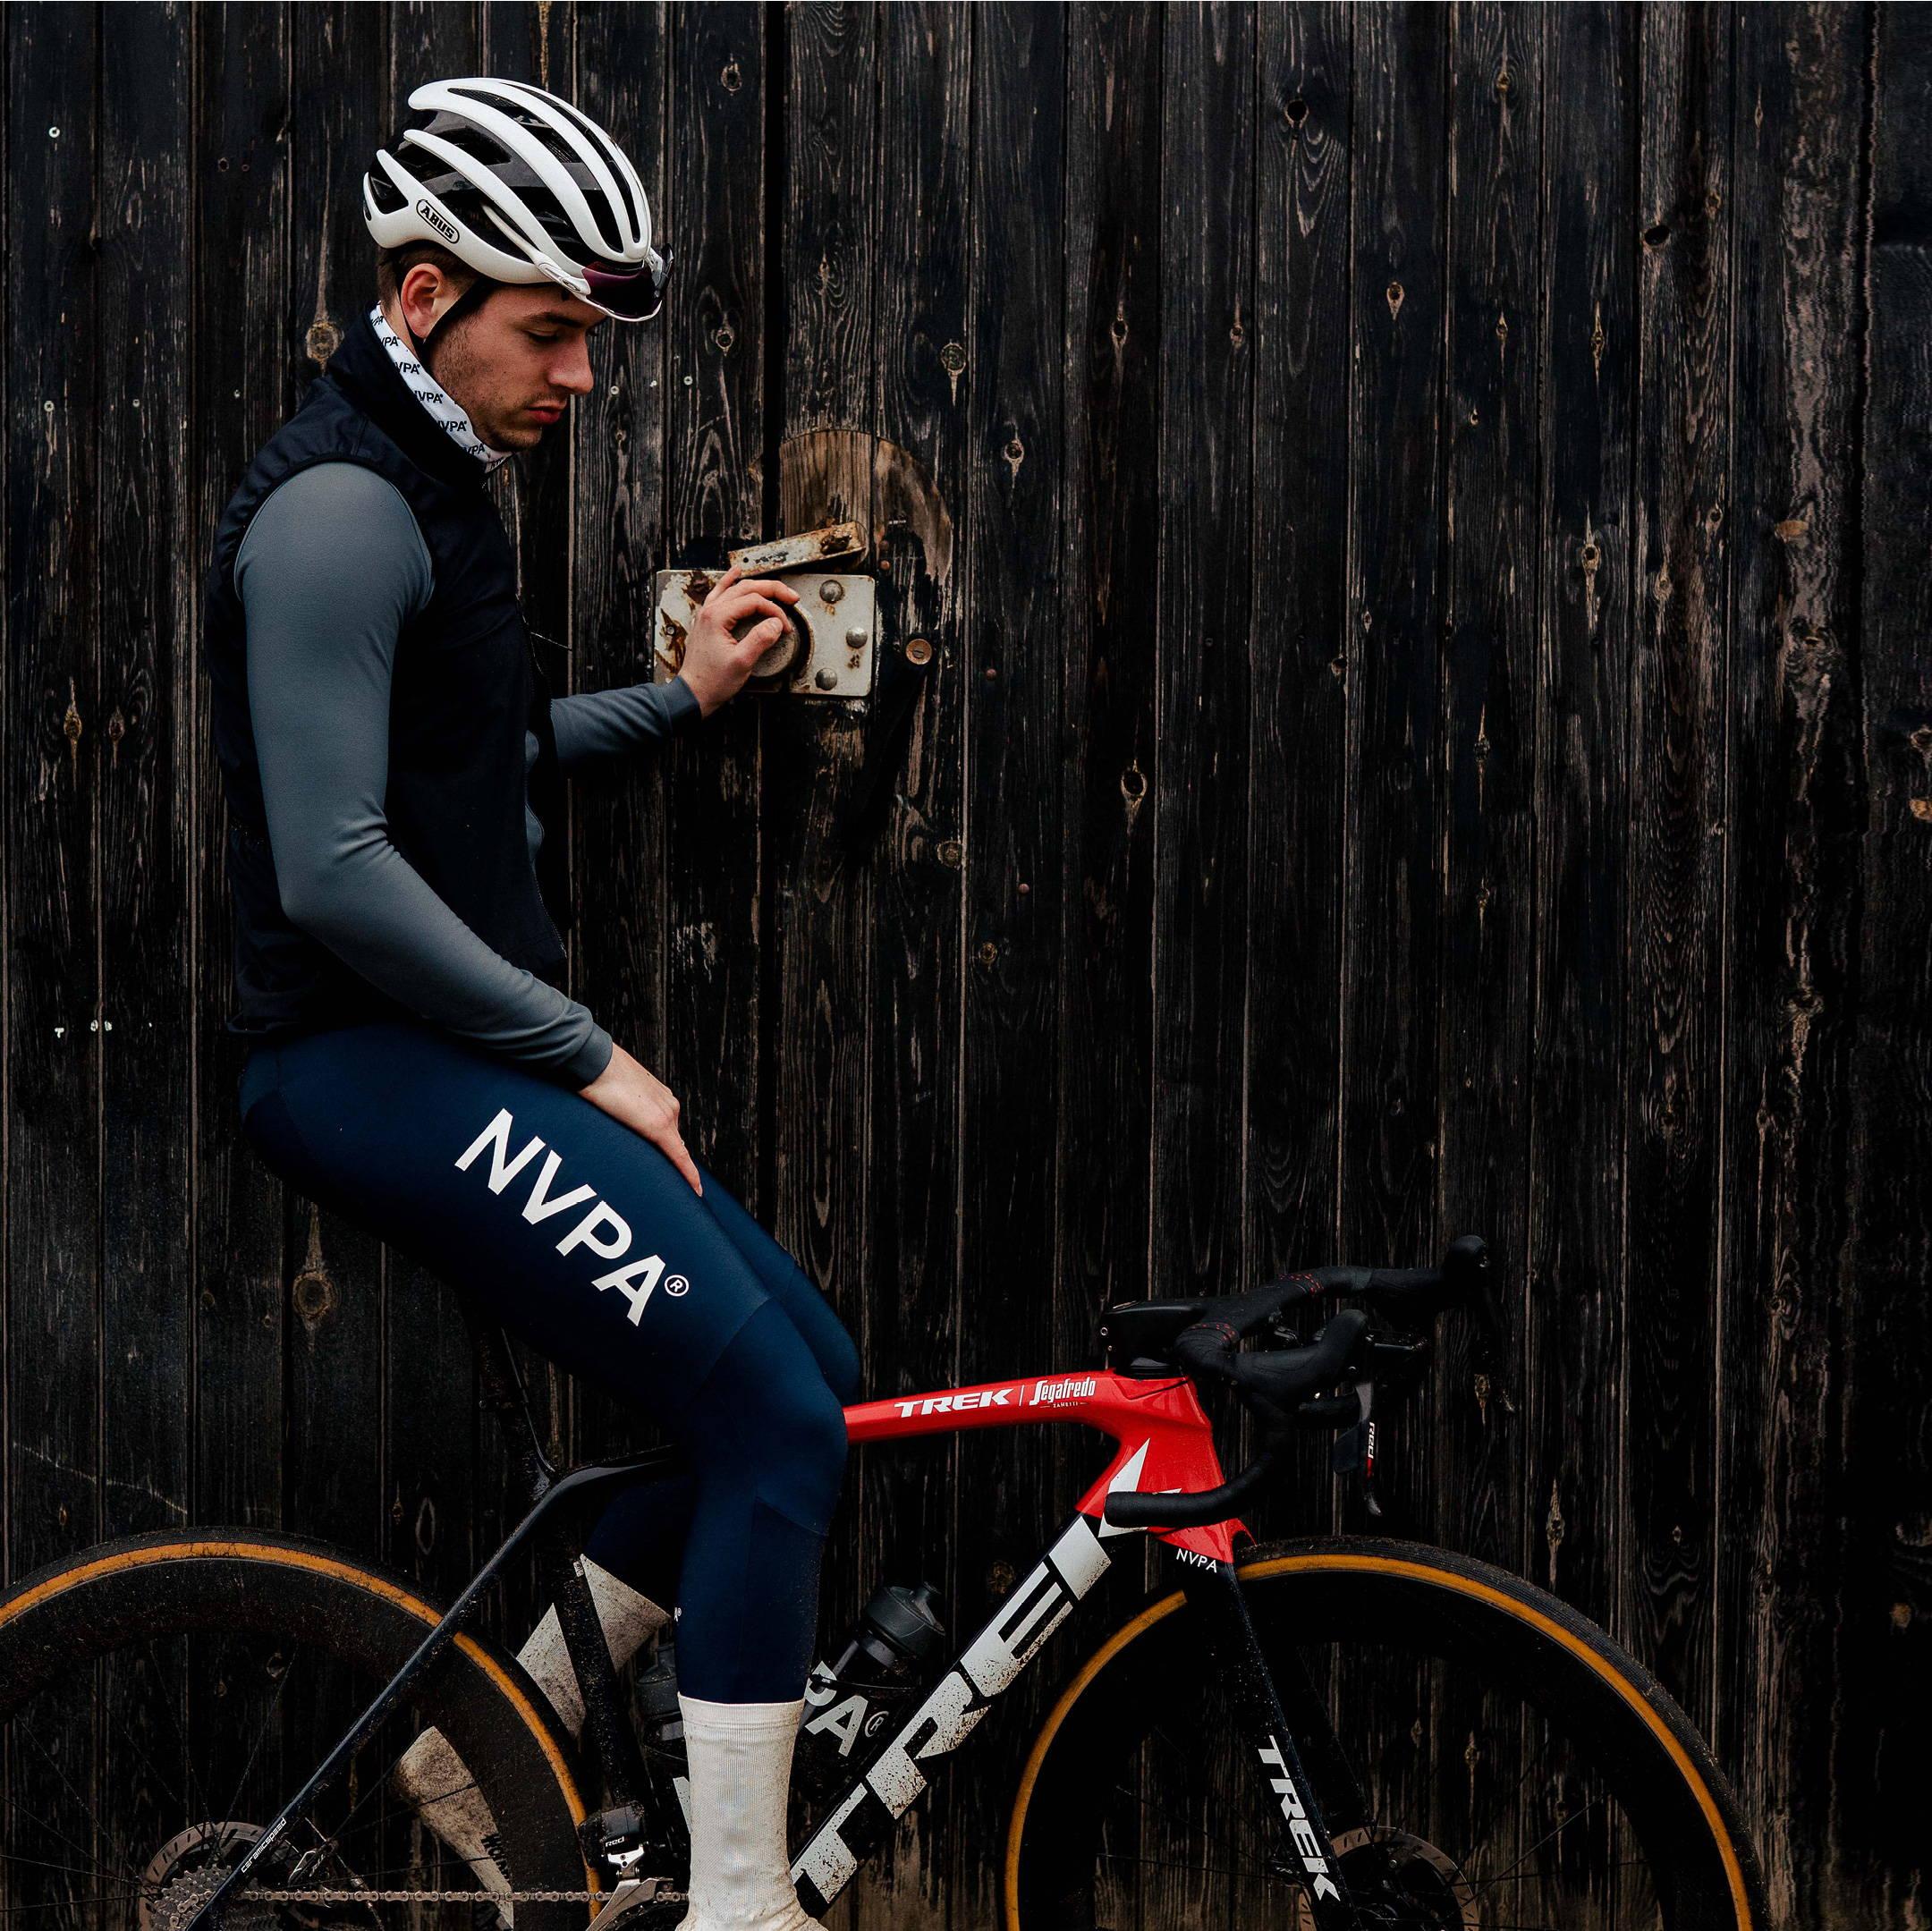 Cyclist wears NVPA